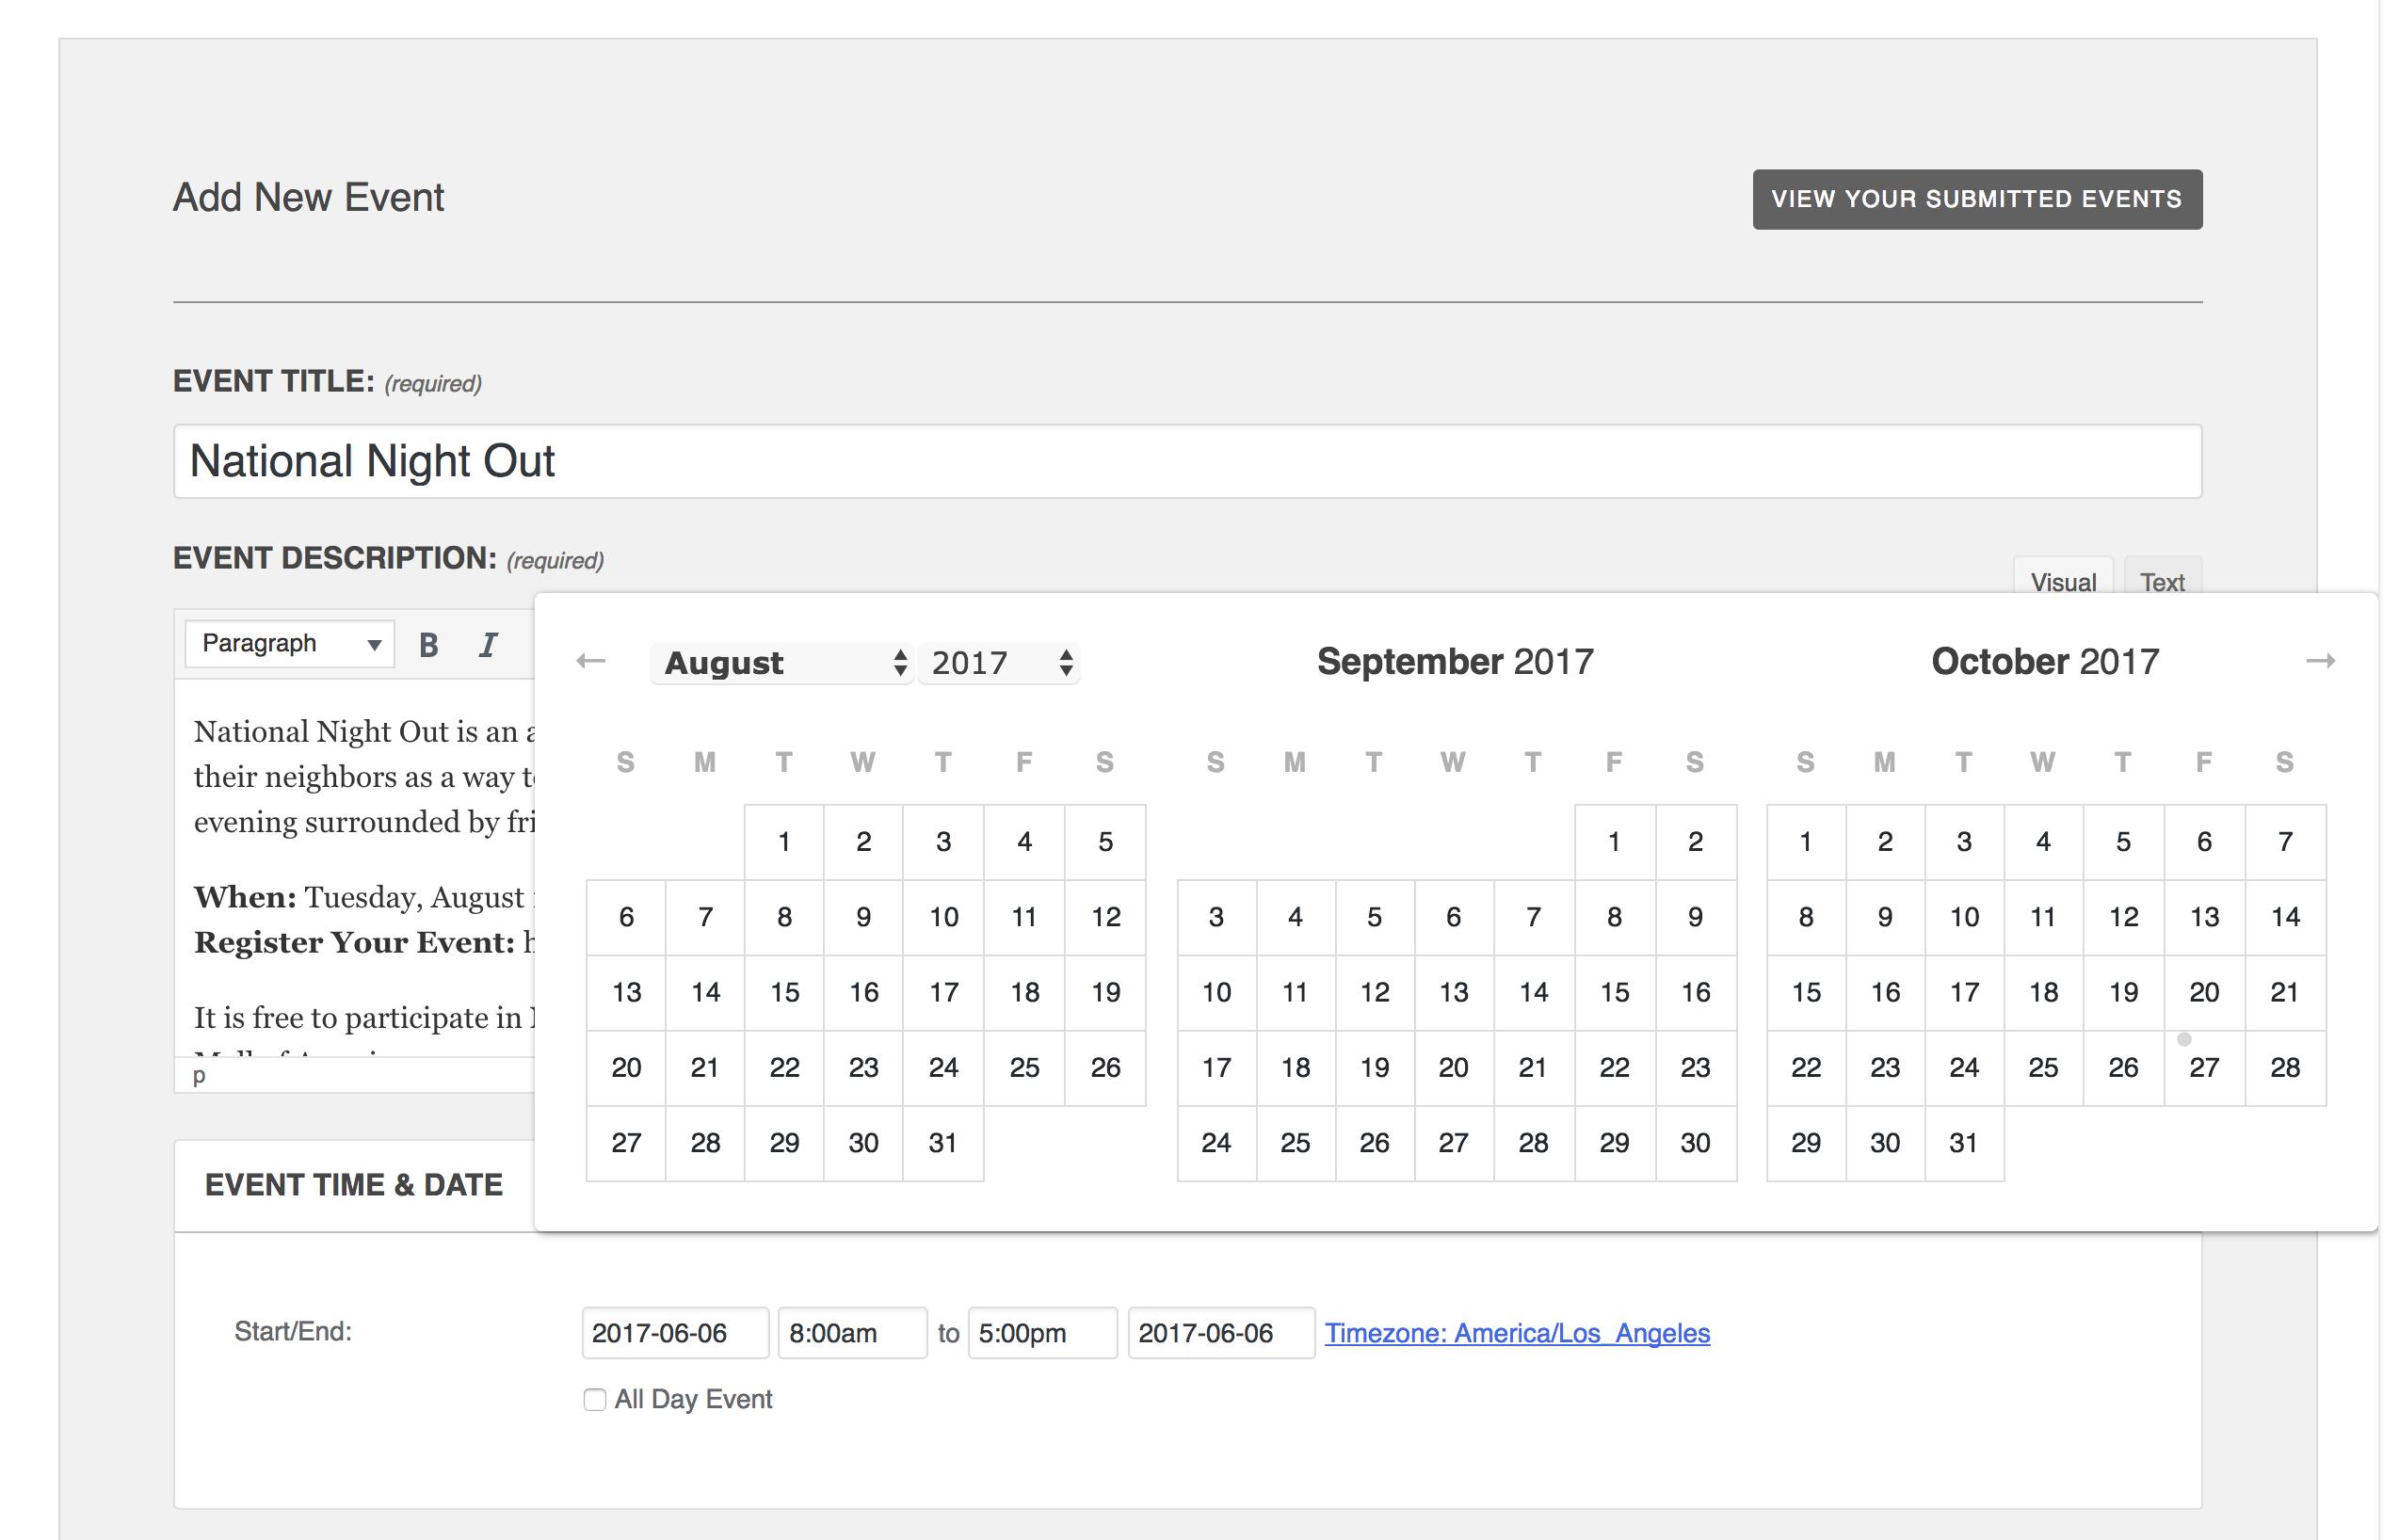 Add Event form screenshot